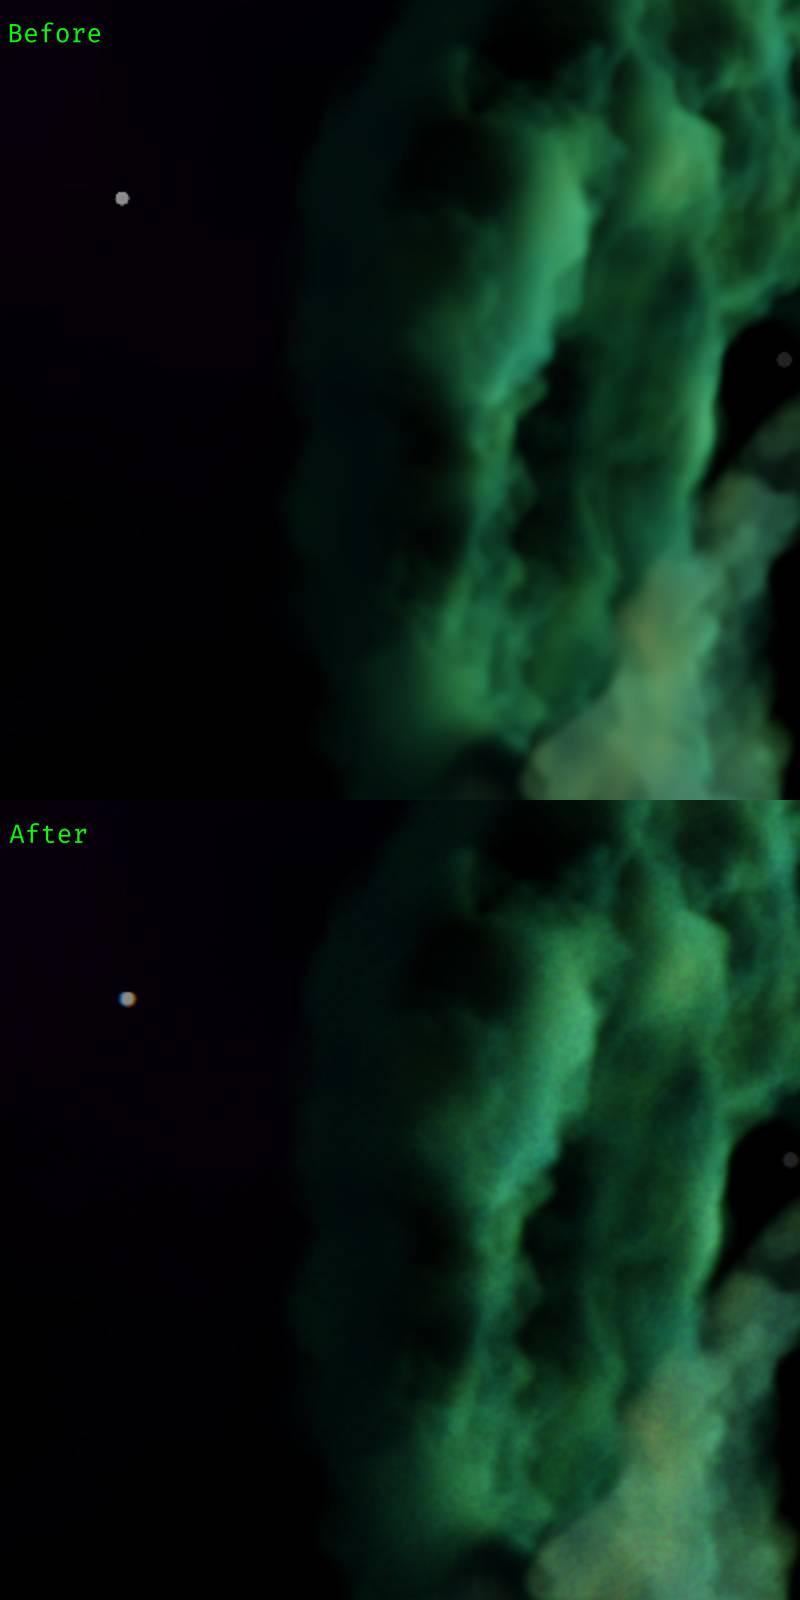 lens dispersion & film_grain, comparison